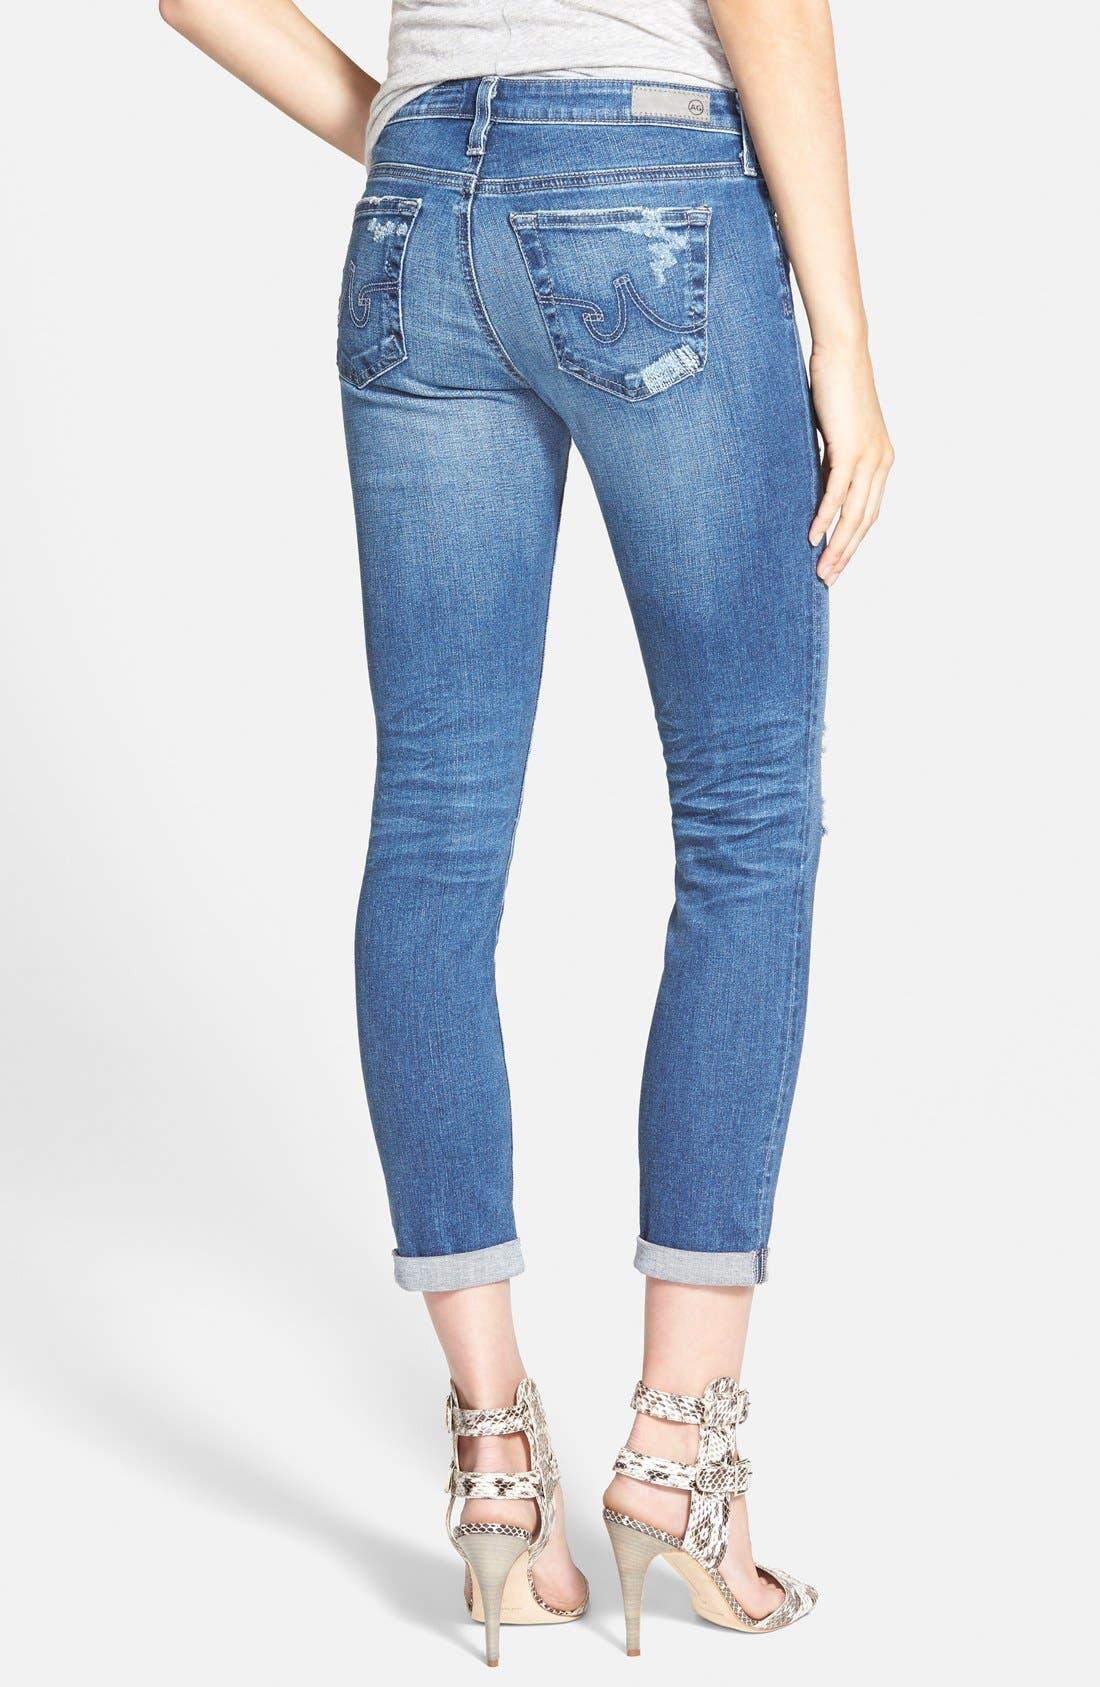 'The Stilt' Roll Cuff Skinny Jeans,                             Alternate thumbnail 2, color,                             400